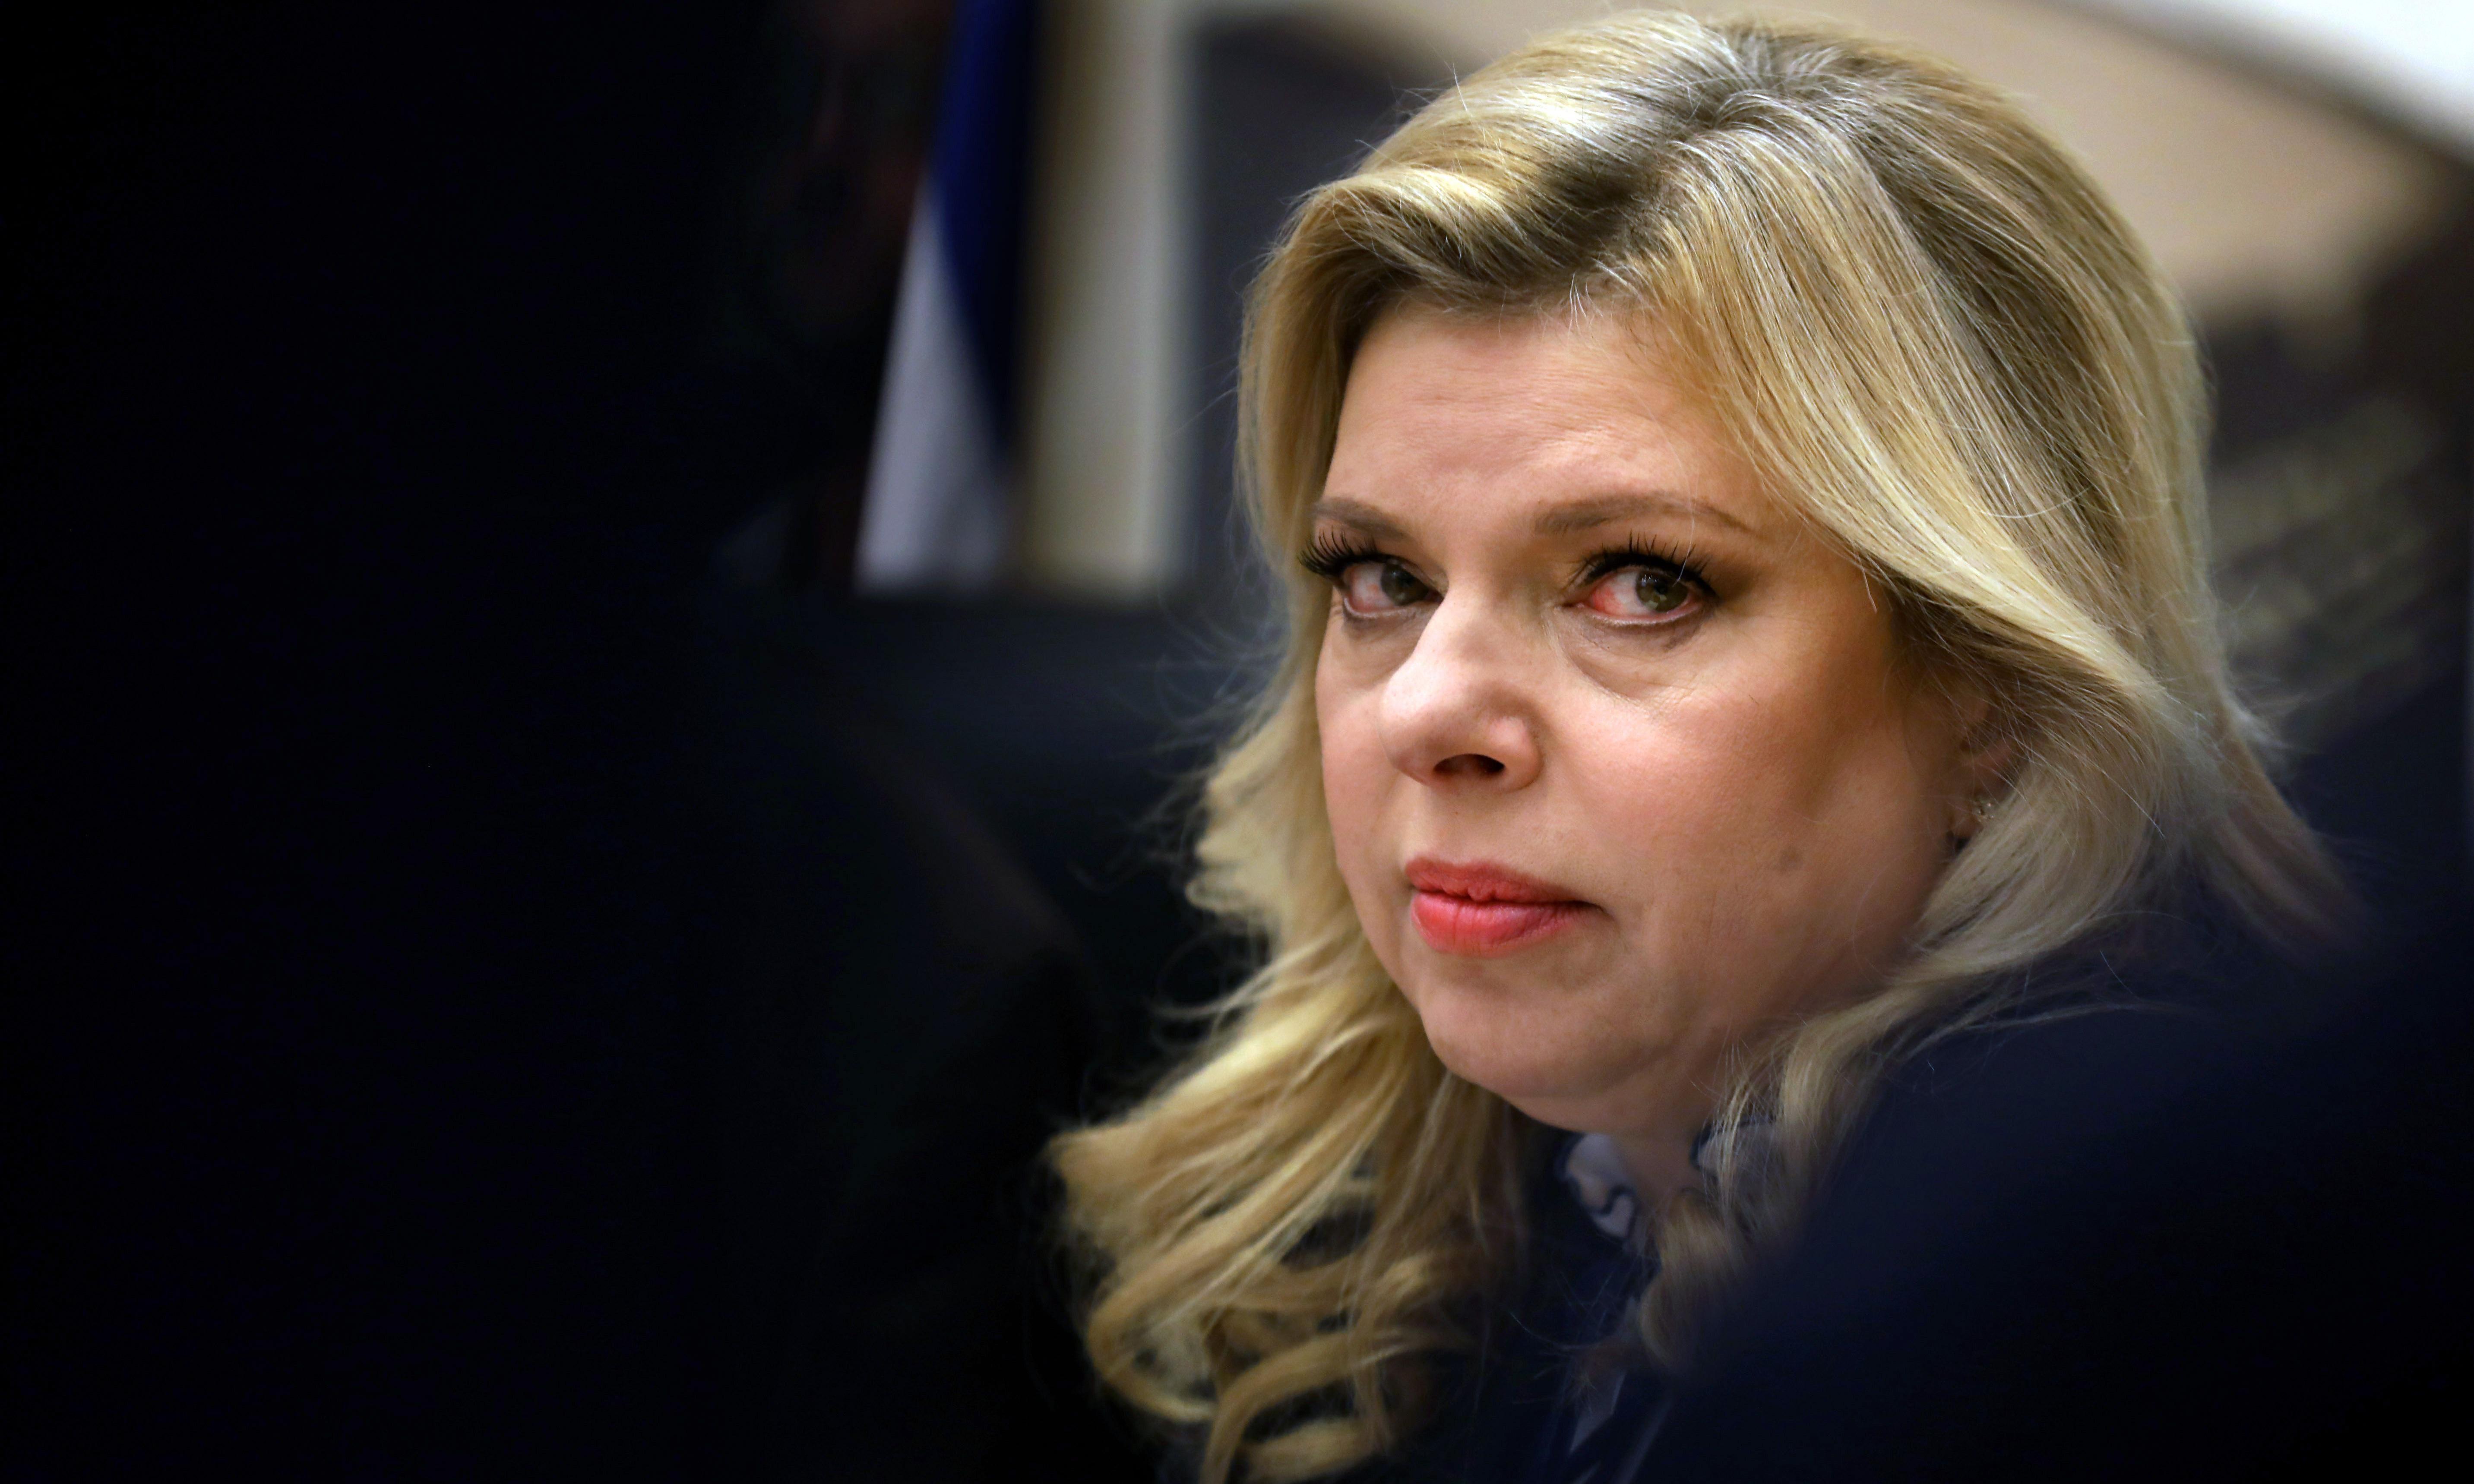 Israeli court convicts Sara Netanyahu for misusing state funds